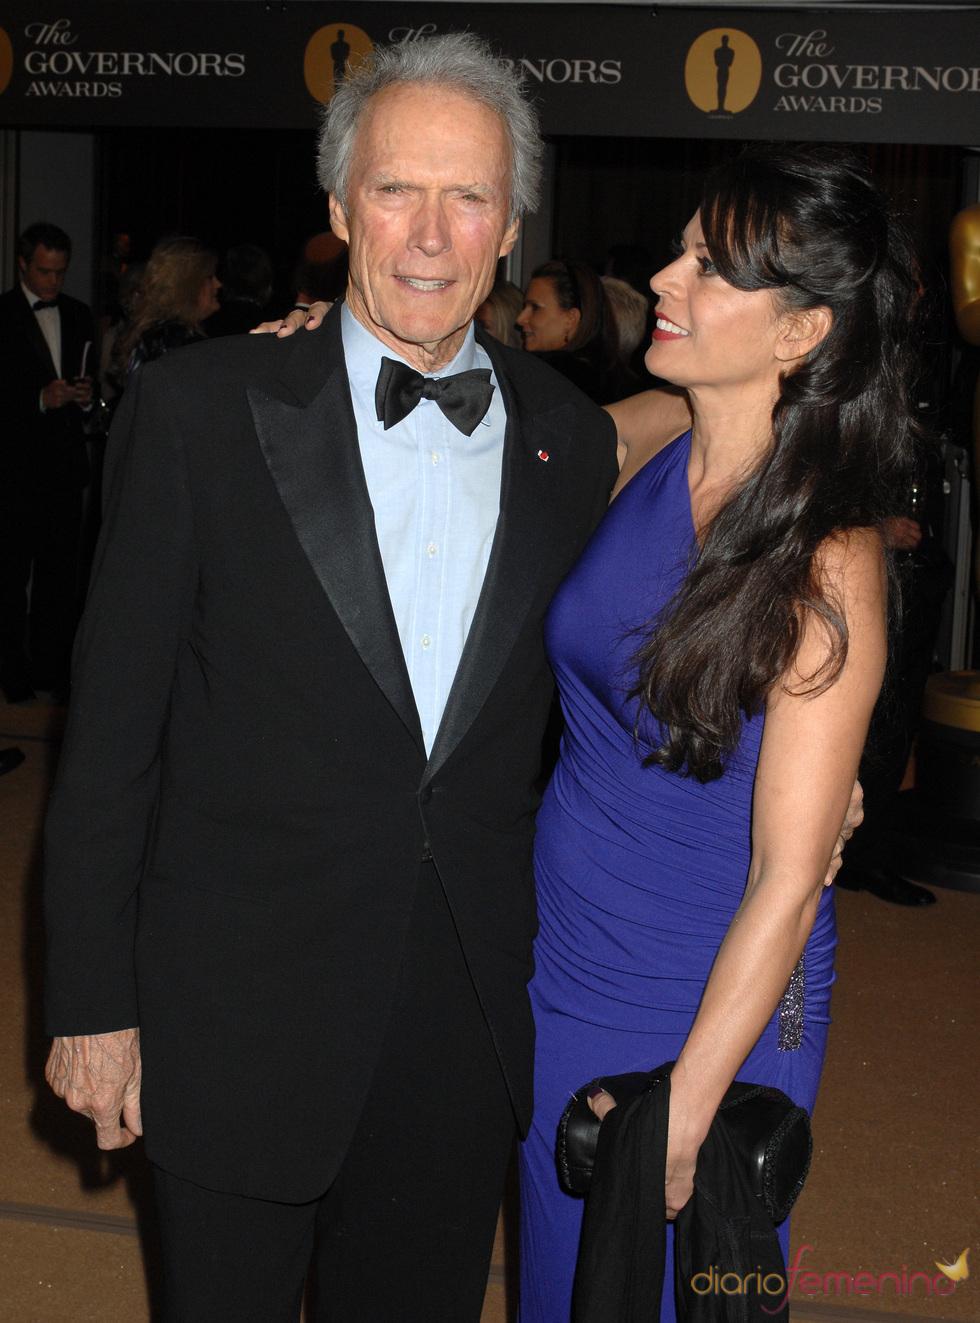 Clint Eastwood y su mujer Dina Louise en los Governors Awards-2010